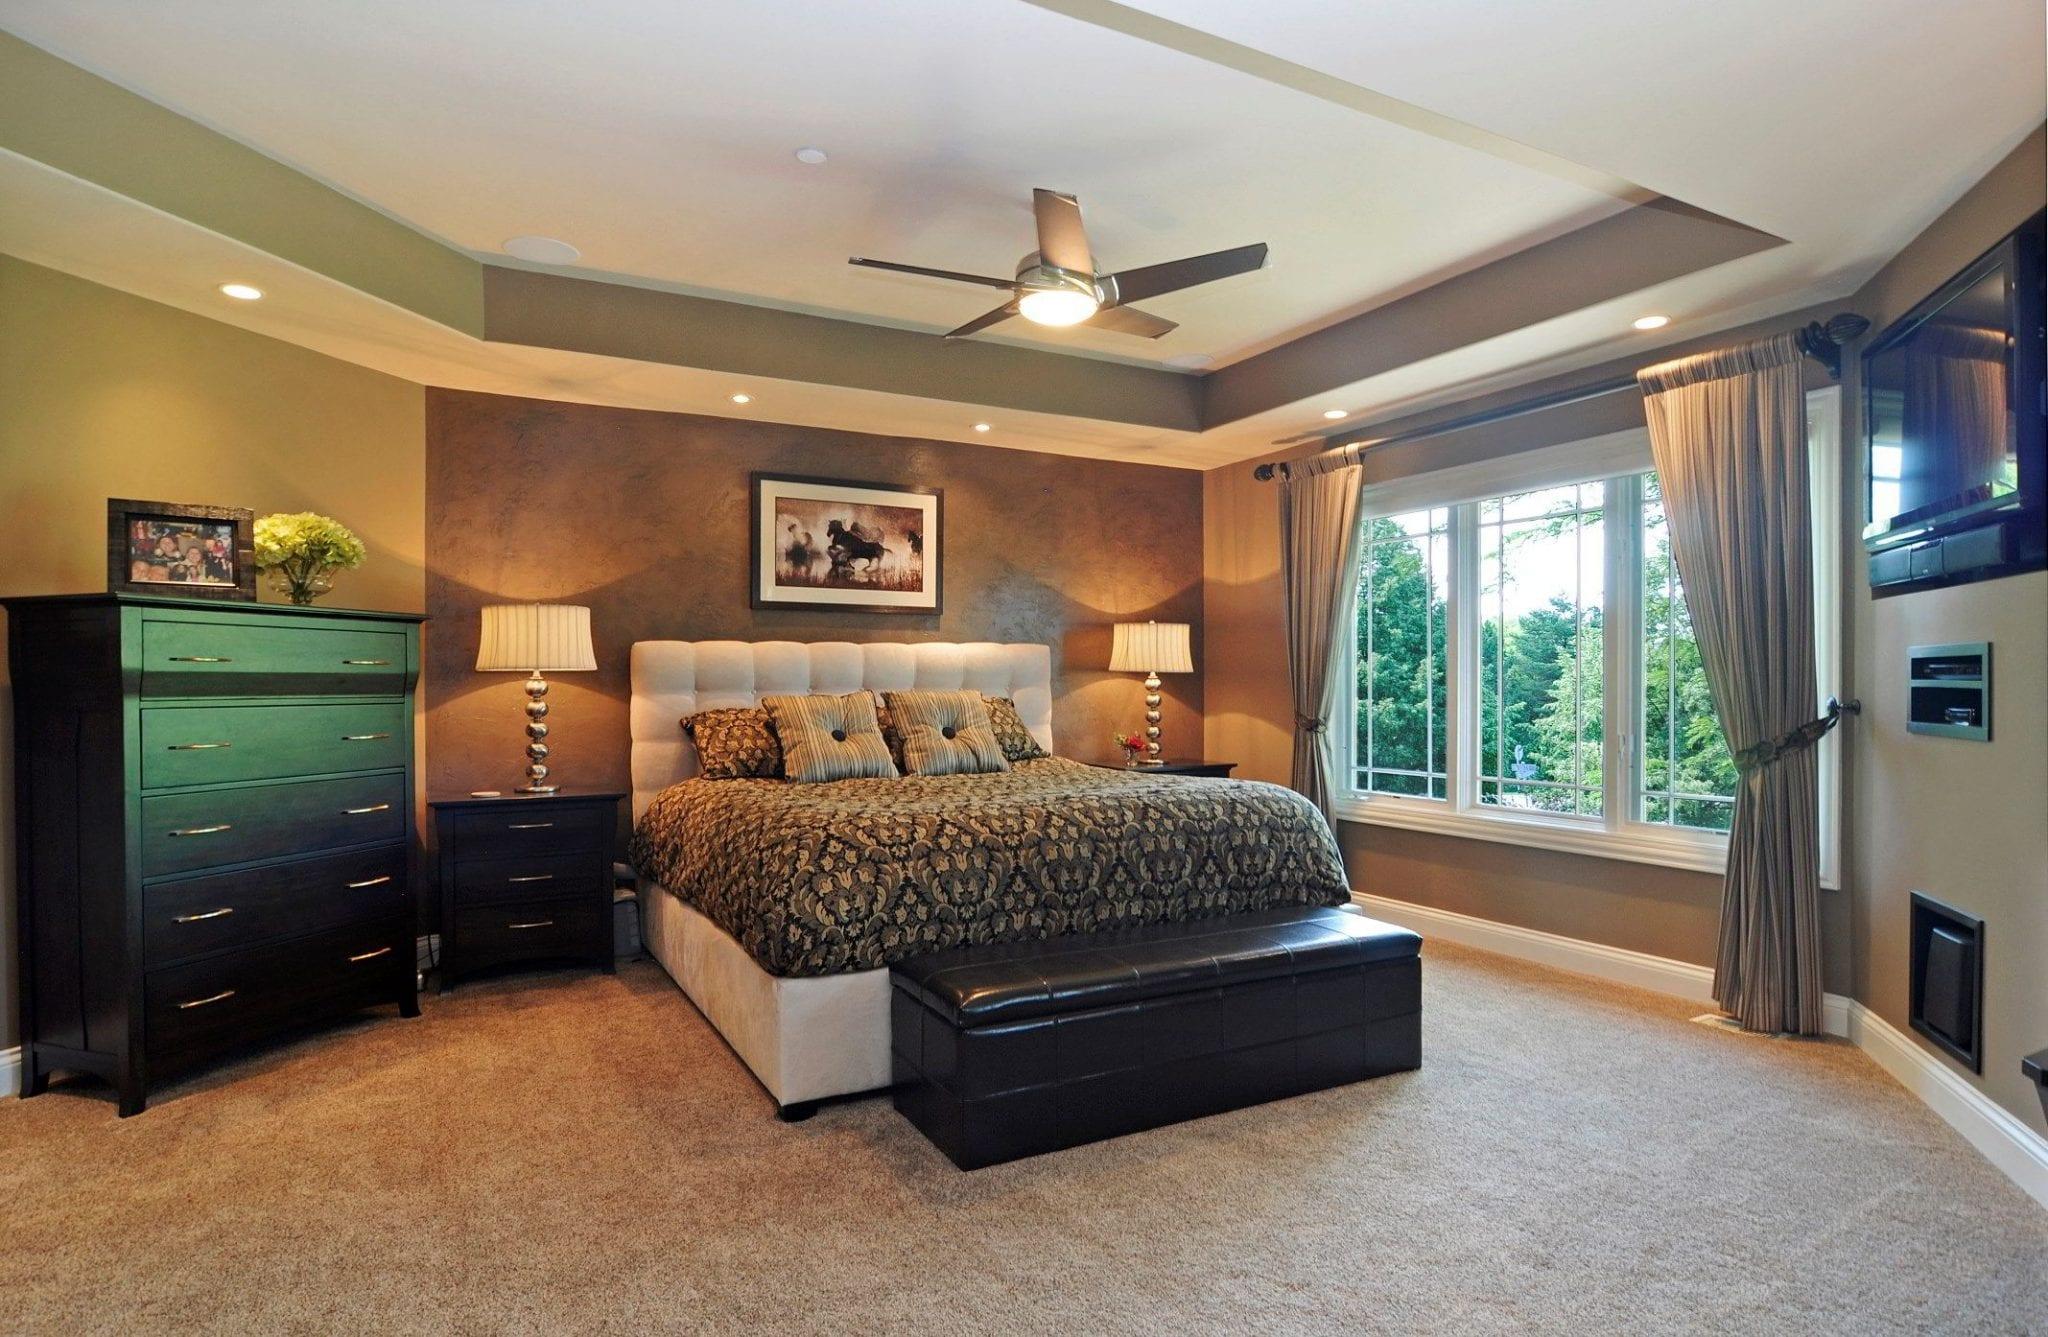 Long Grove Home Remodeling Master Bedroom Design by Illinois Dennis Frankowski of DF Design, Inc